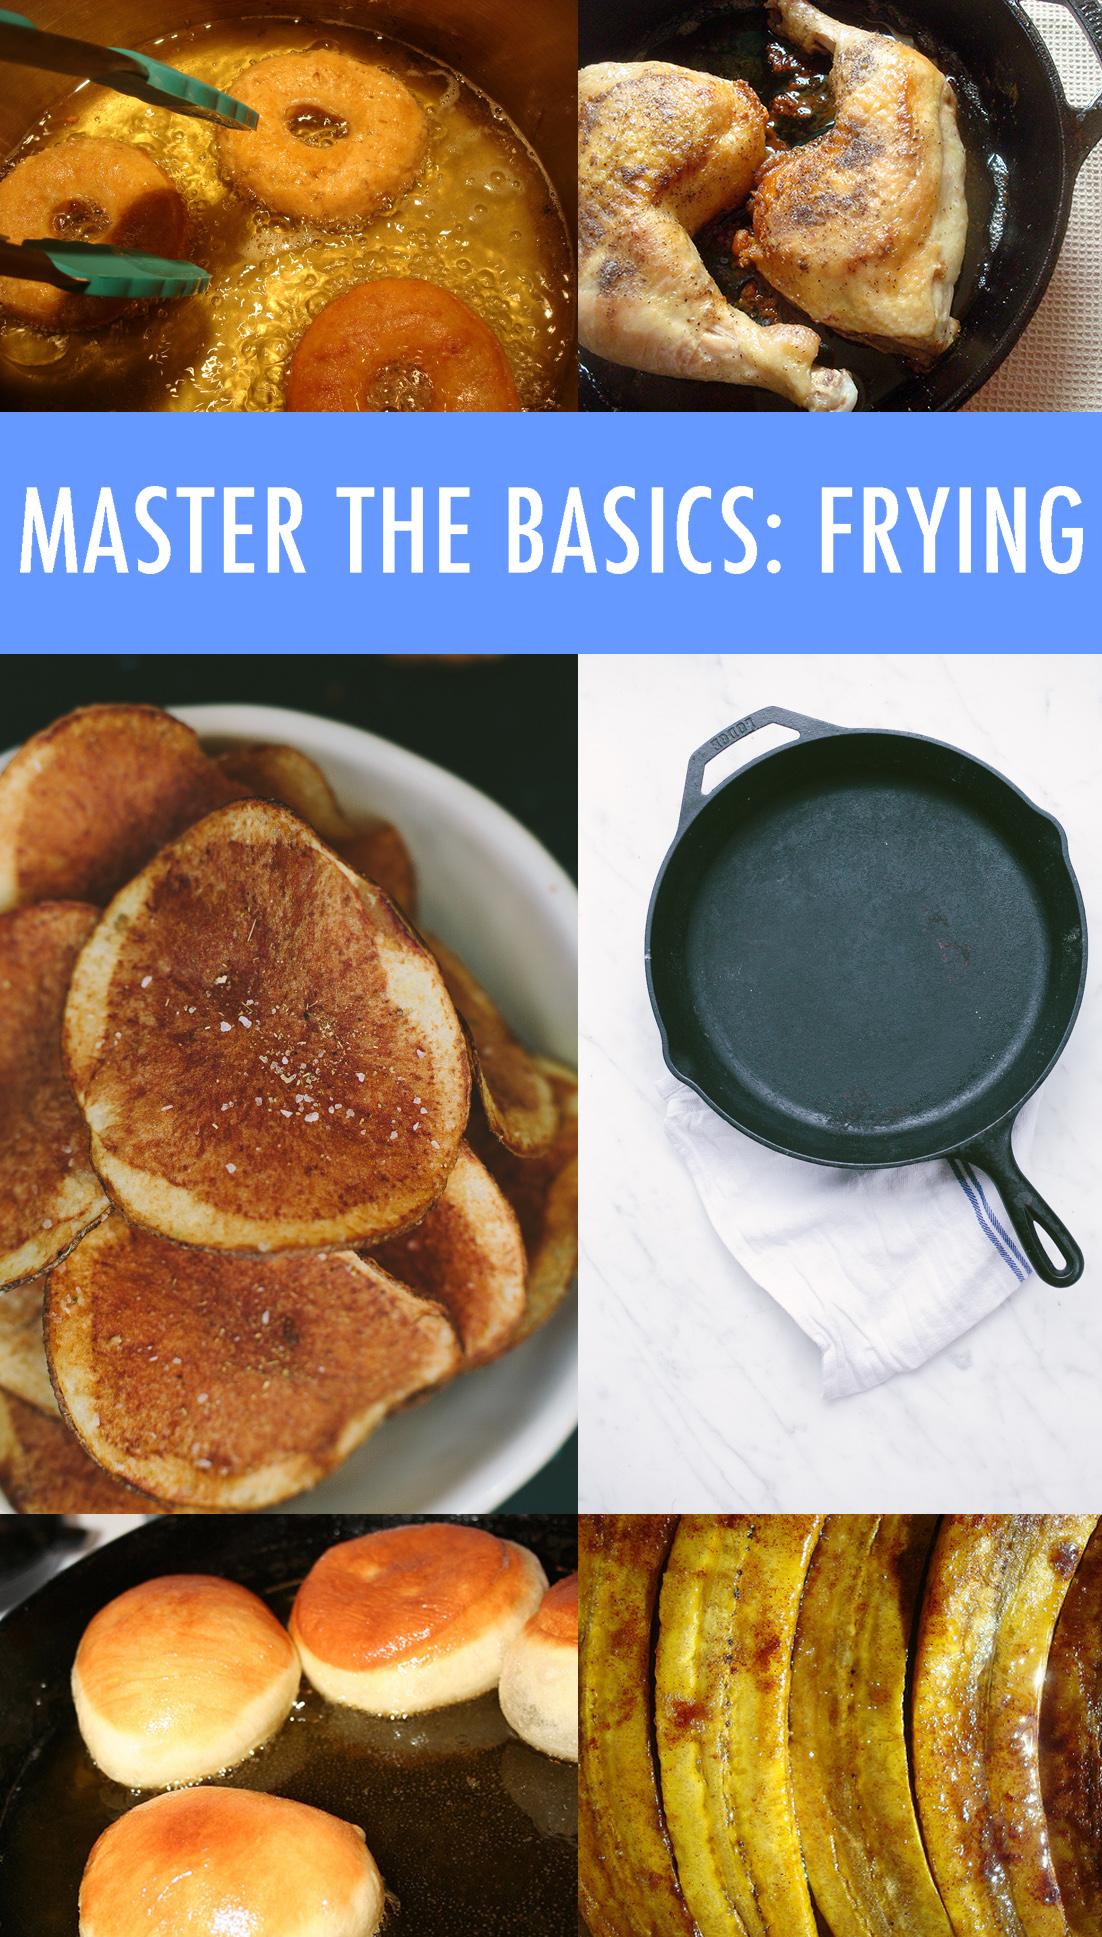 Frying basics